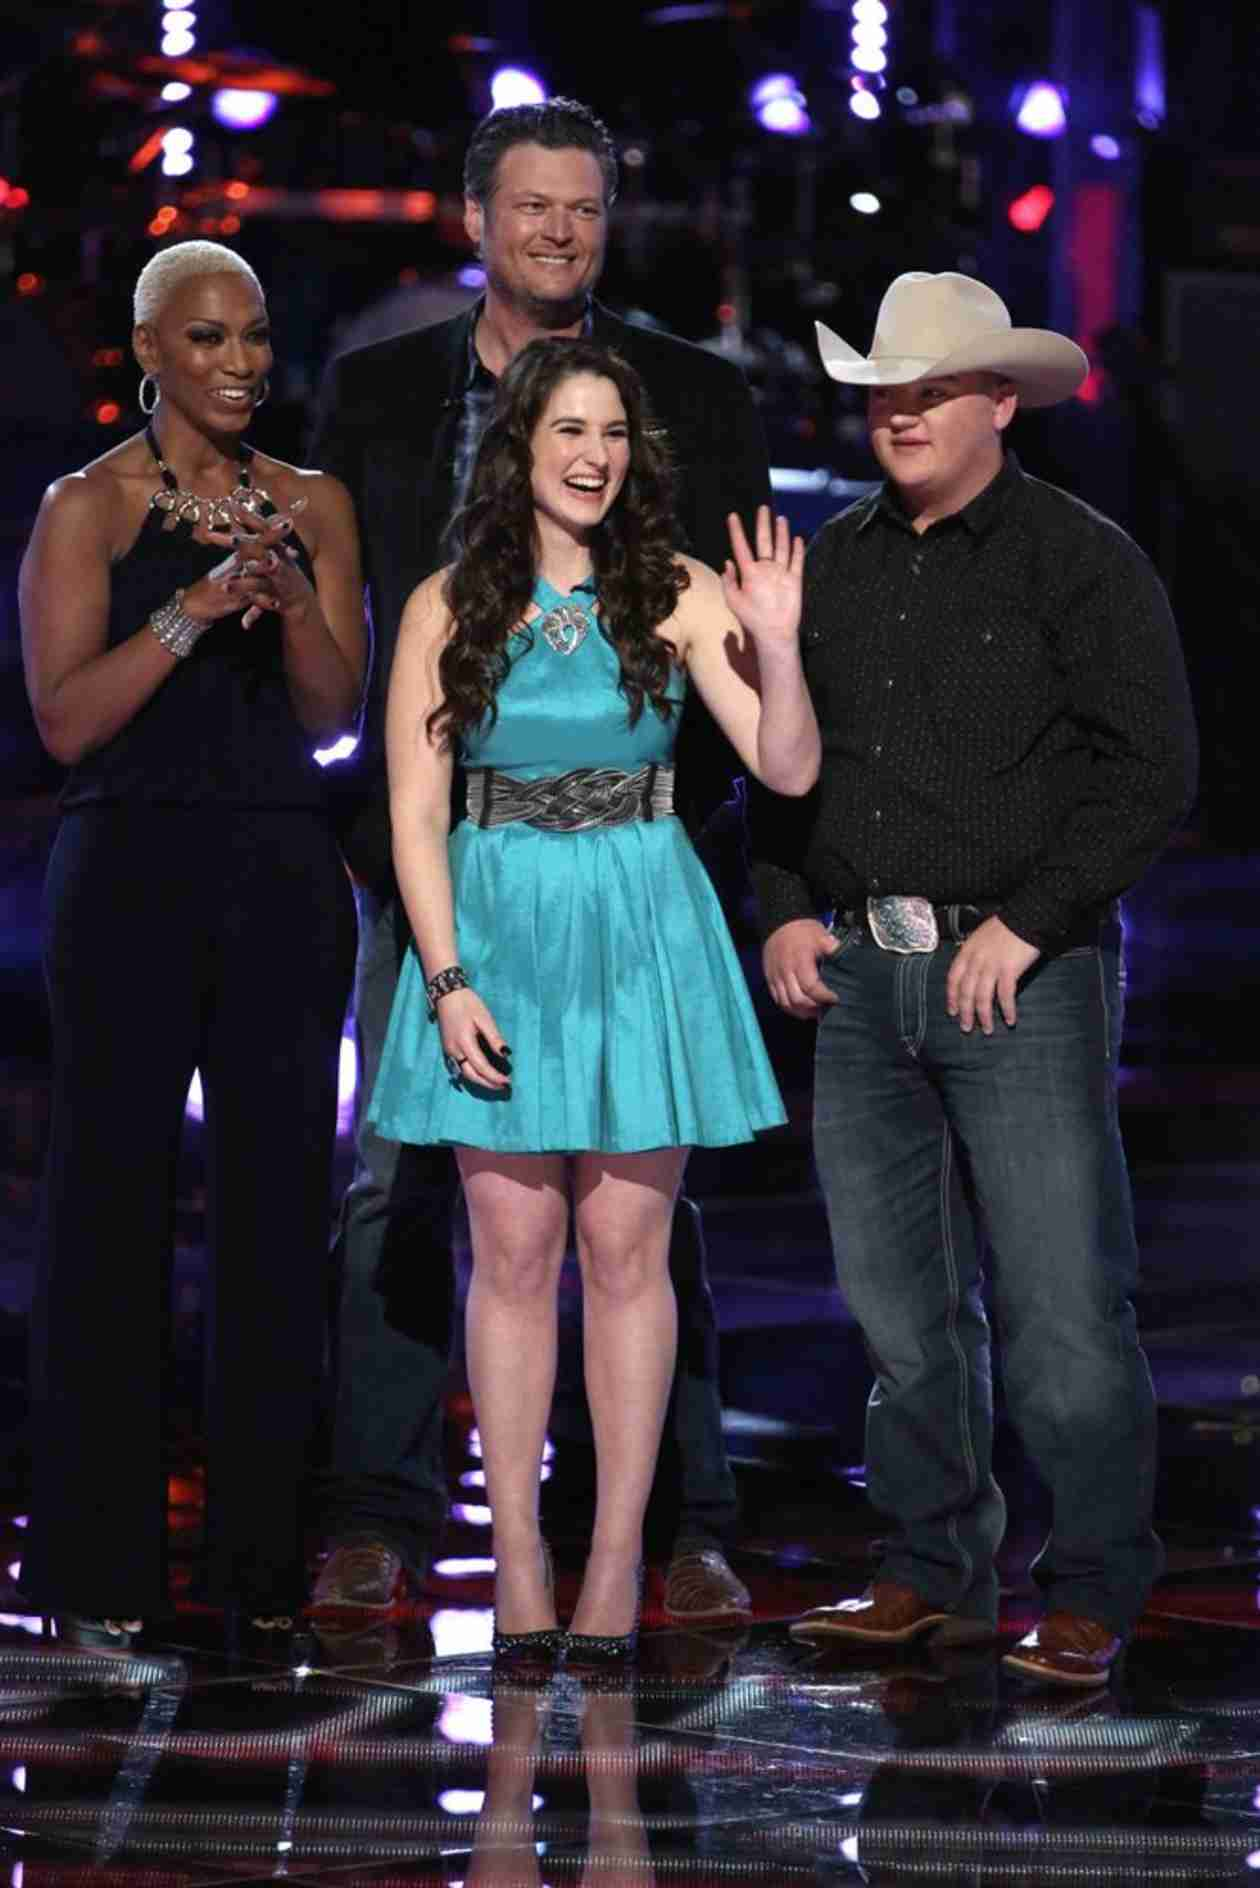 The Voice Season 6 Playoffs: Who Will Blake Shelton Take to the Live Shows?